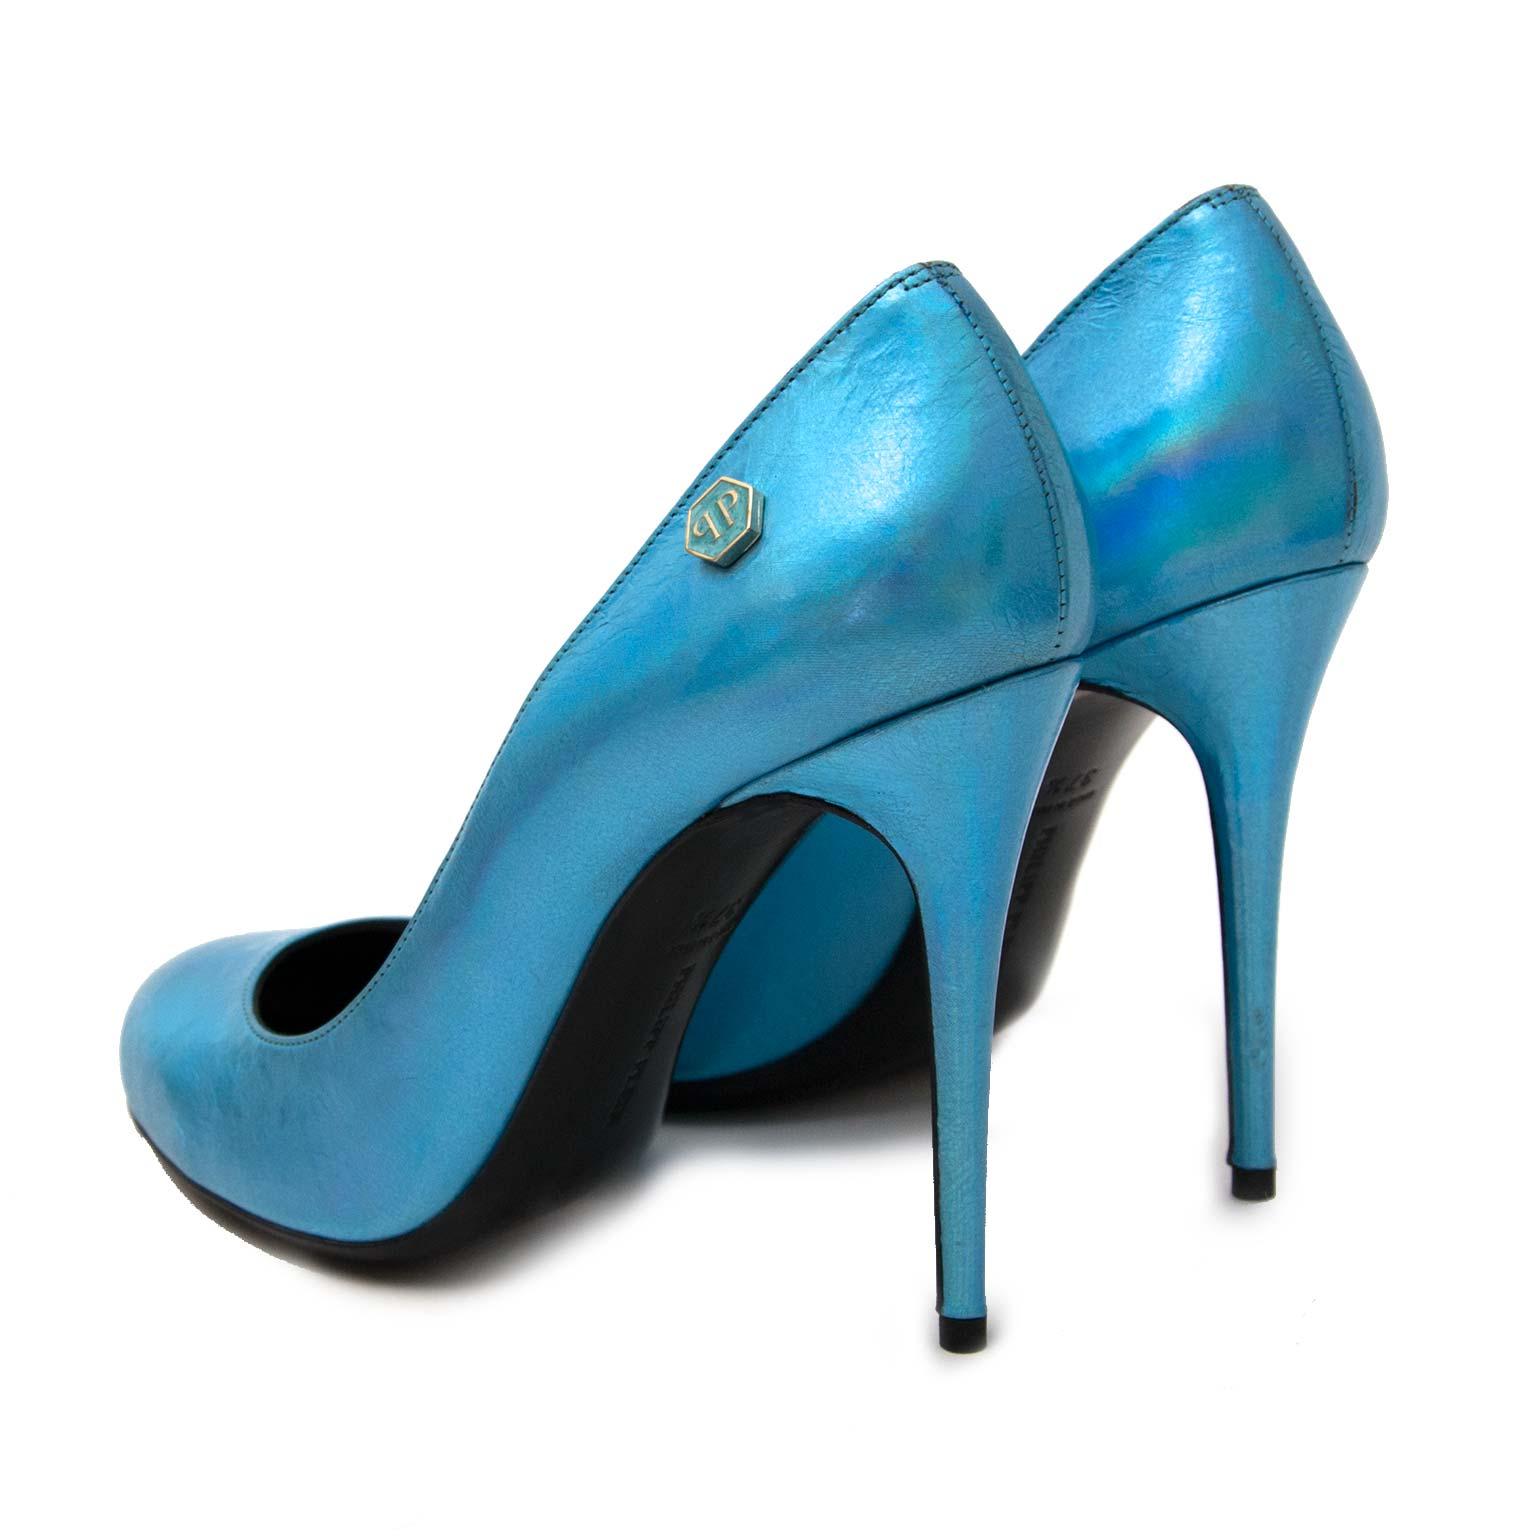 Philipp Plein 'Fortuna Plango' Irridescent Blue Pumps